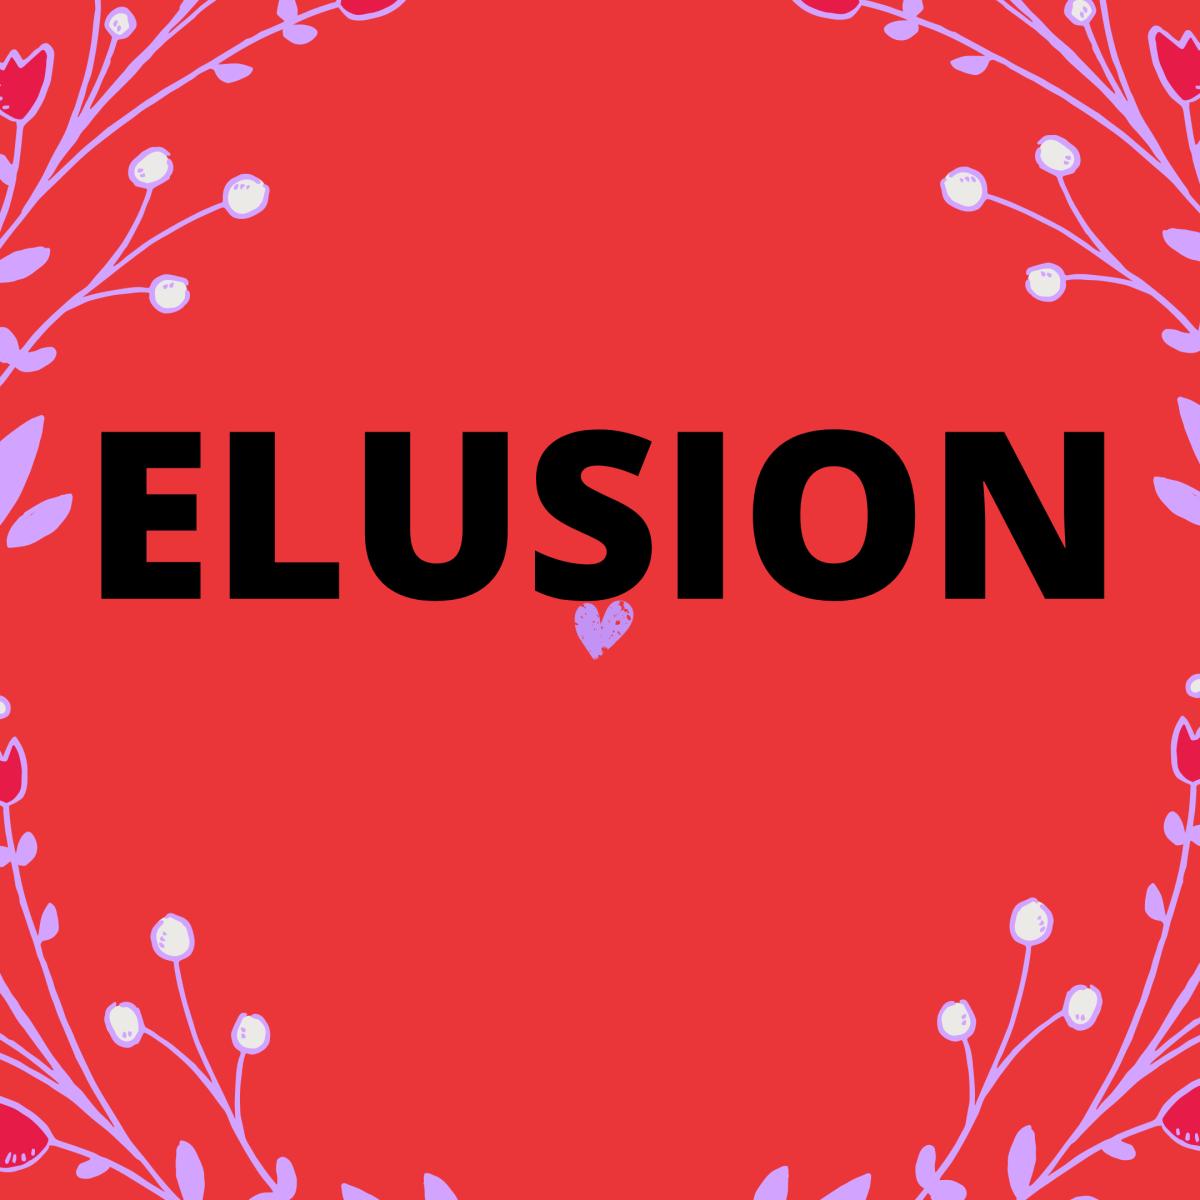 The Elusion